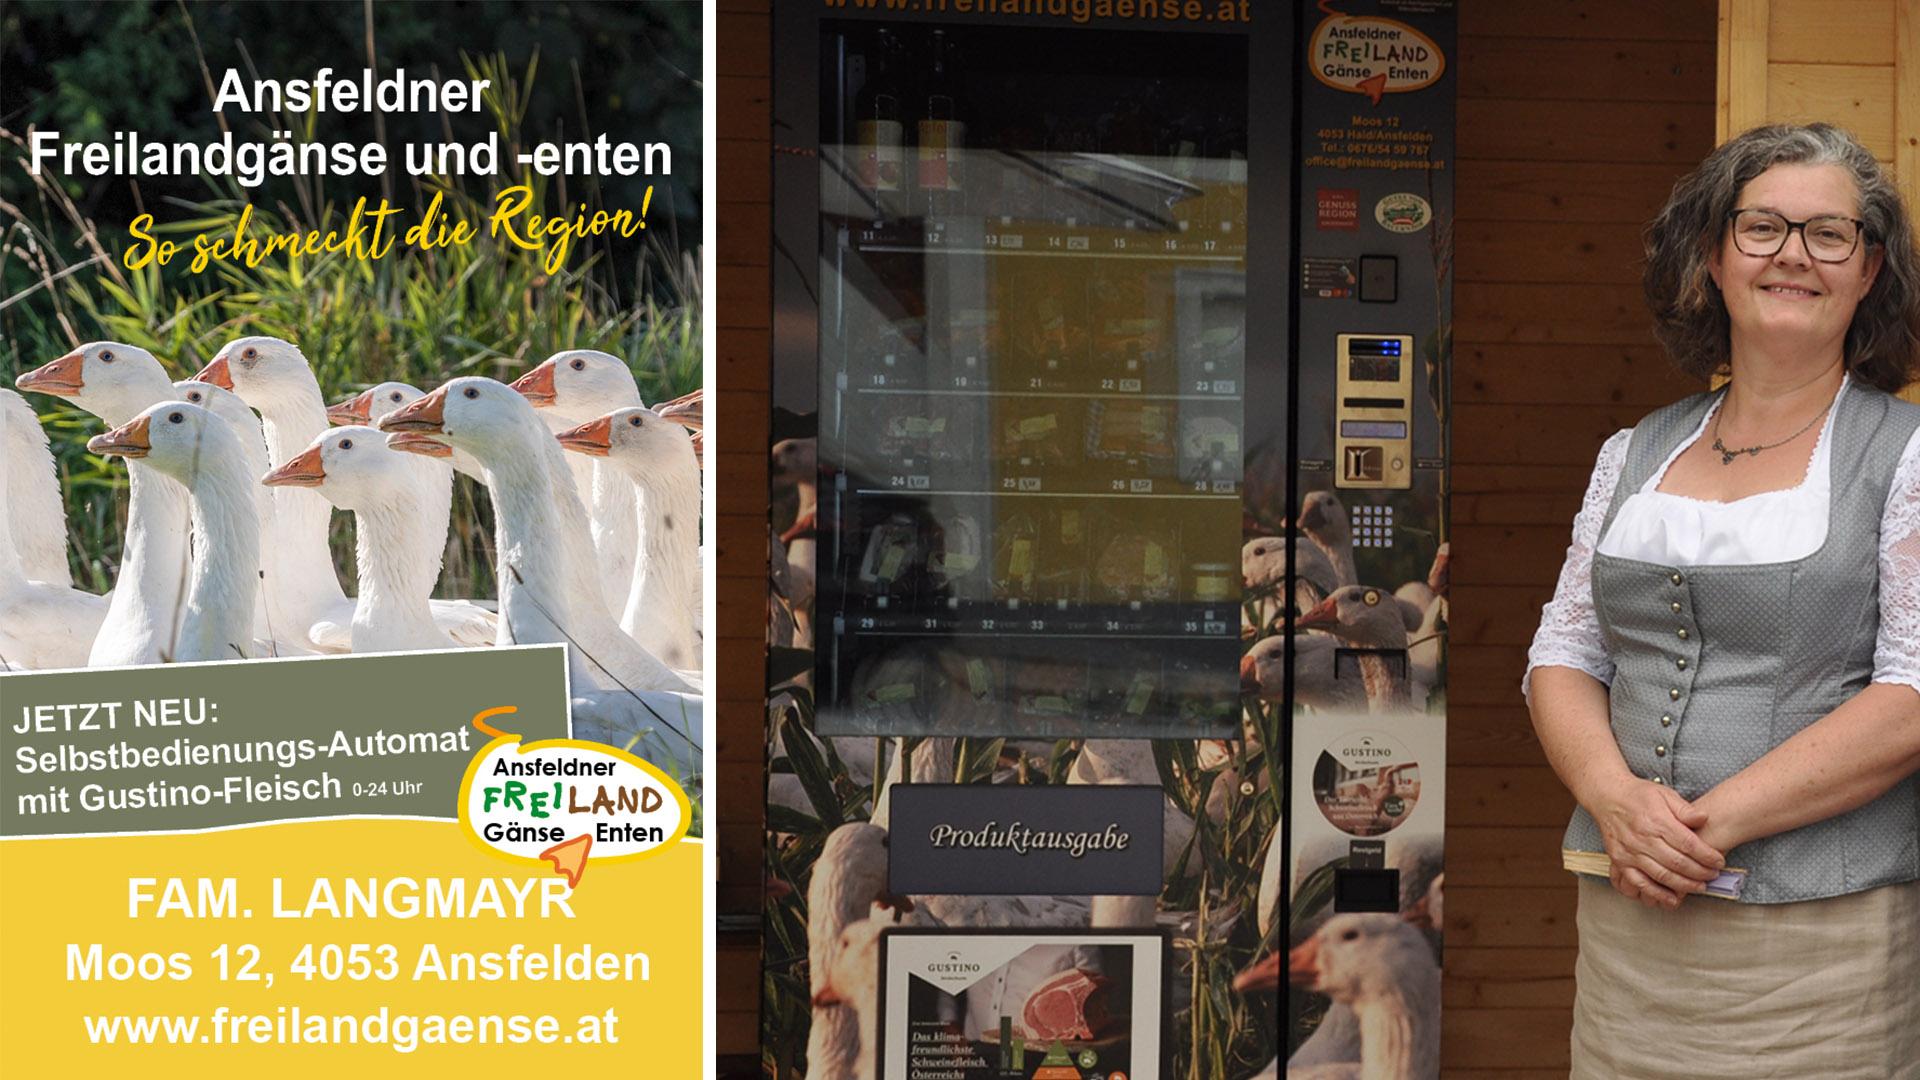 Ansfeldner Freilandgaense Automat Gustino Hofsaft